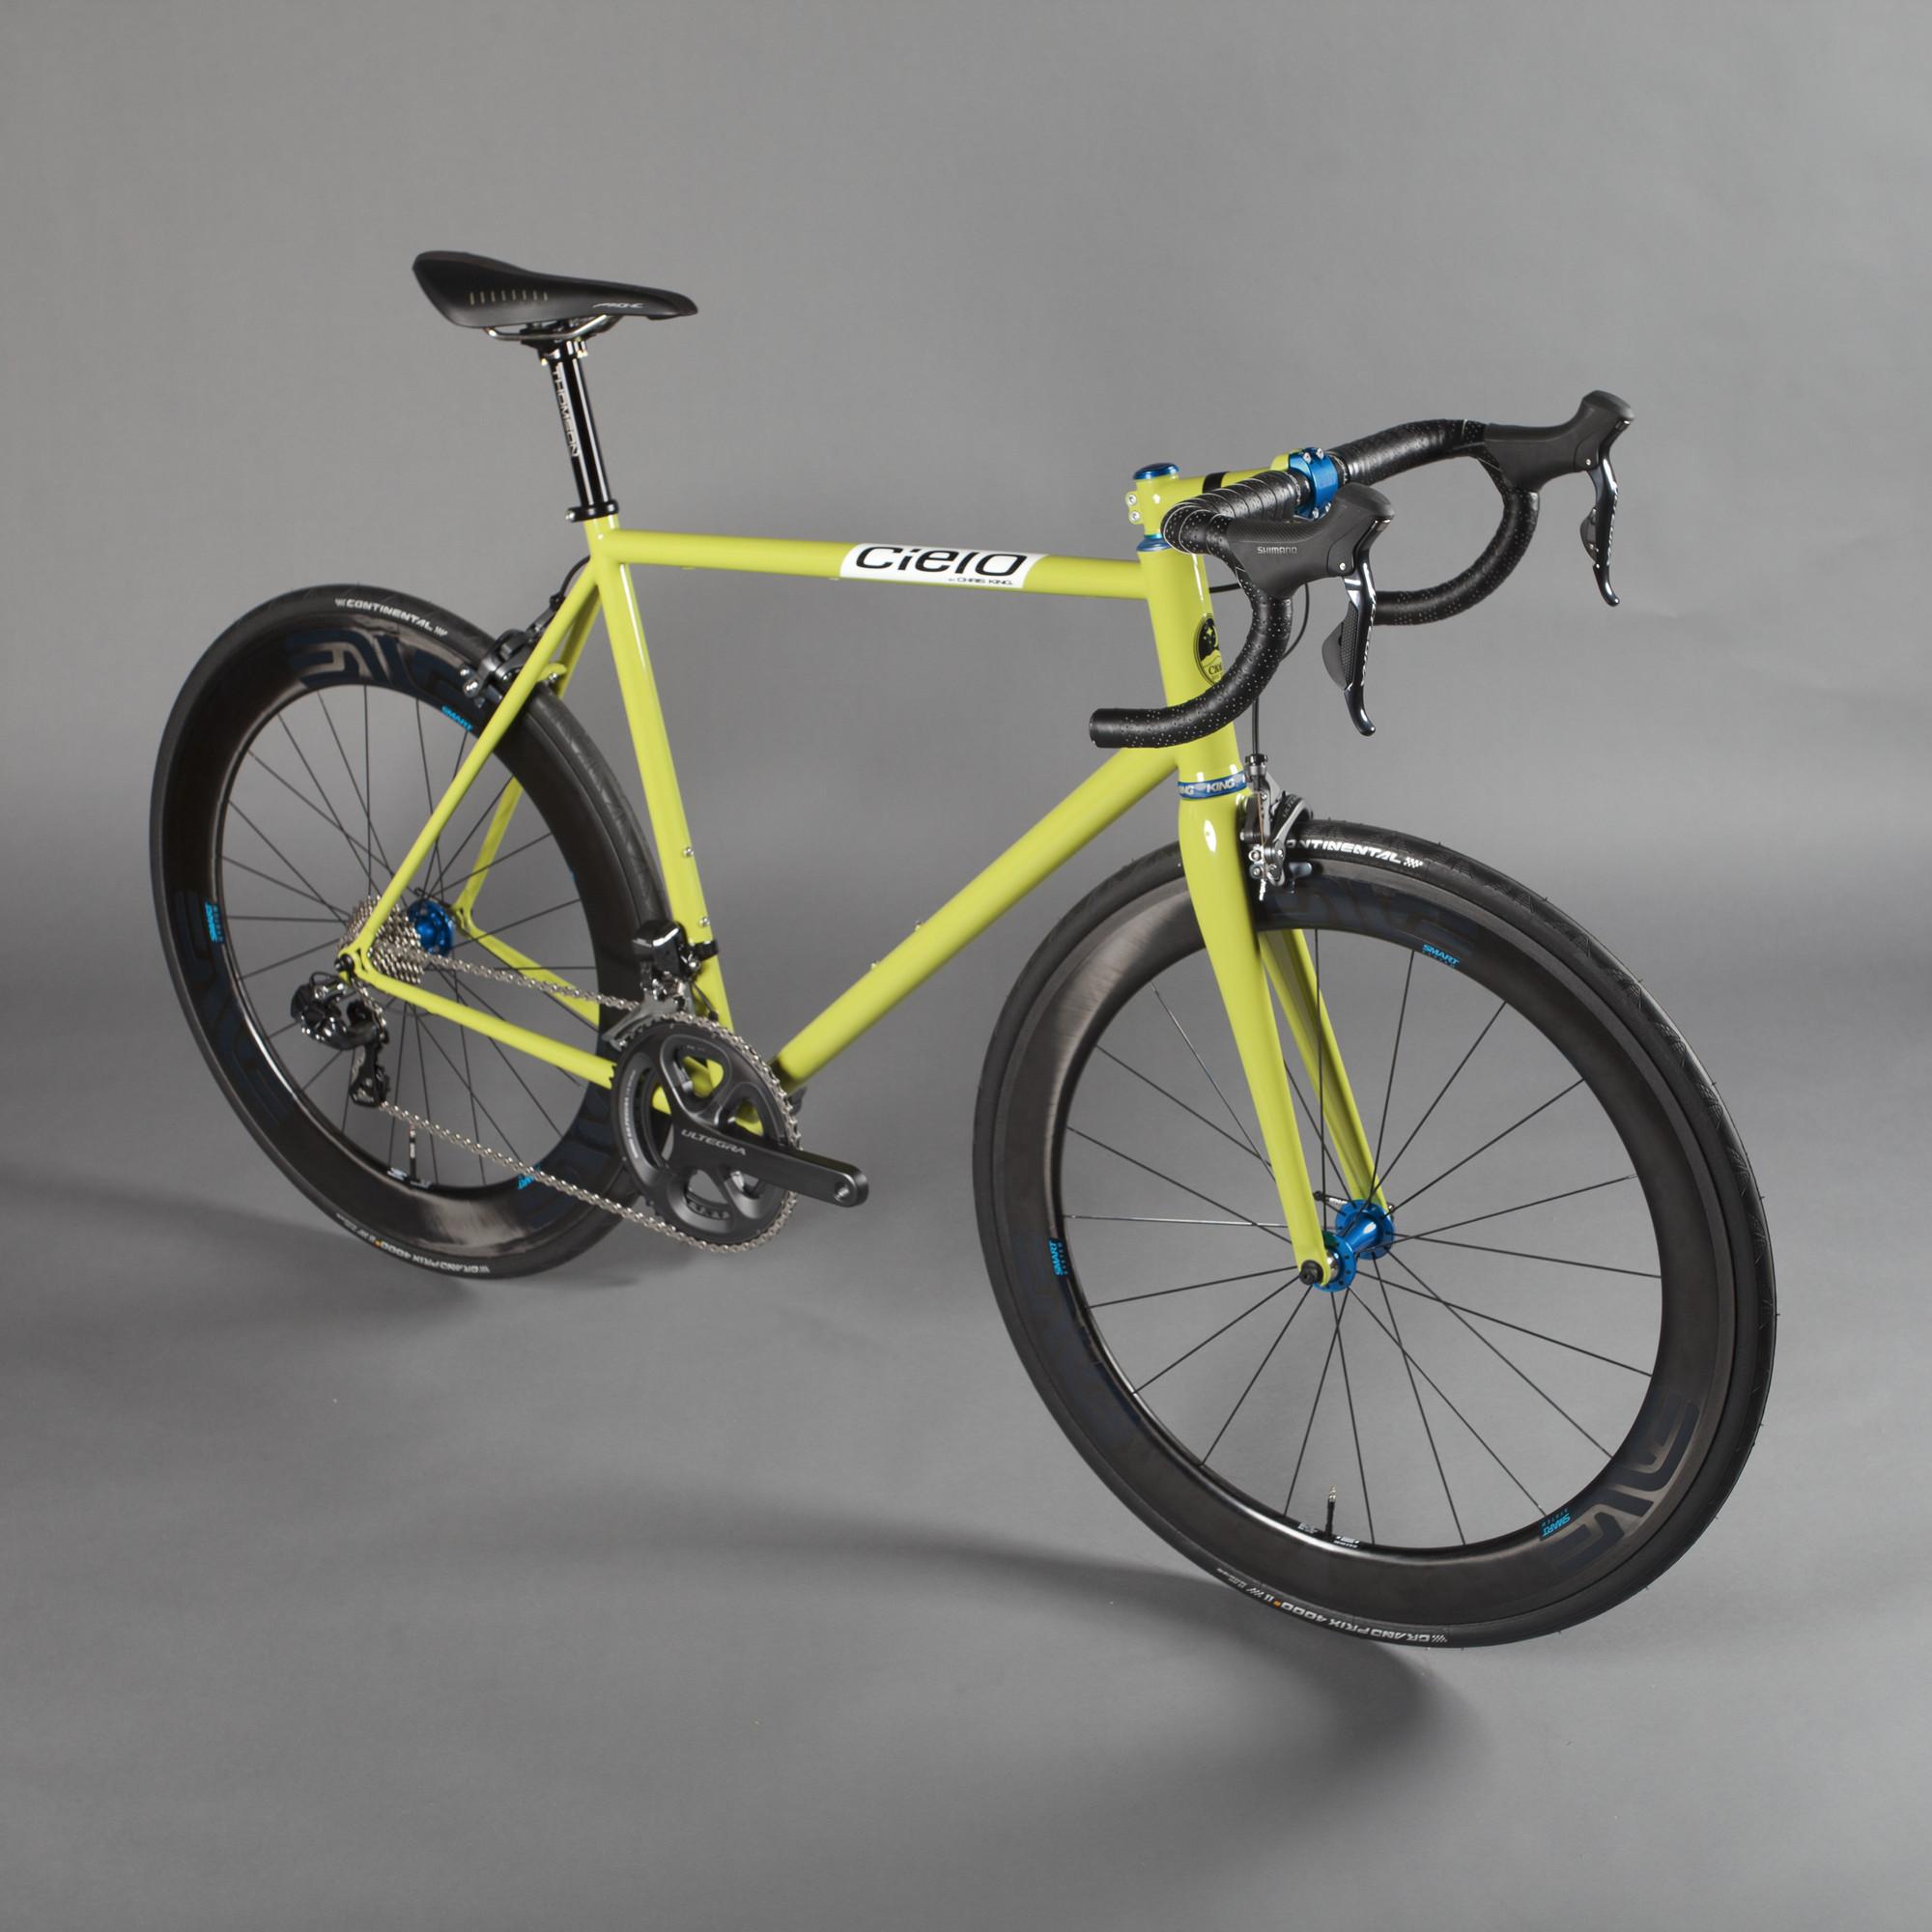 RS925_cielo_roadracer_chartreuse_full 2-lpr